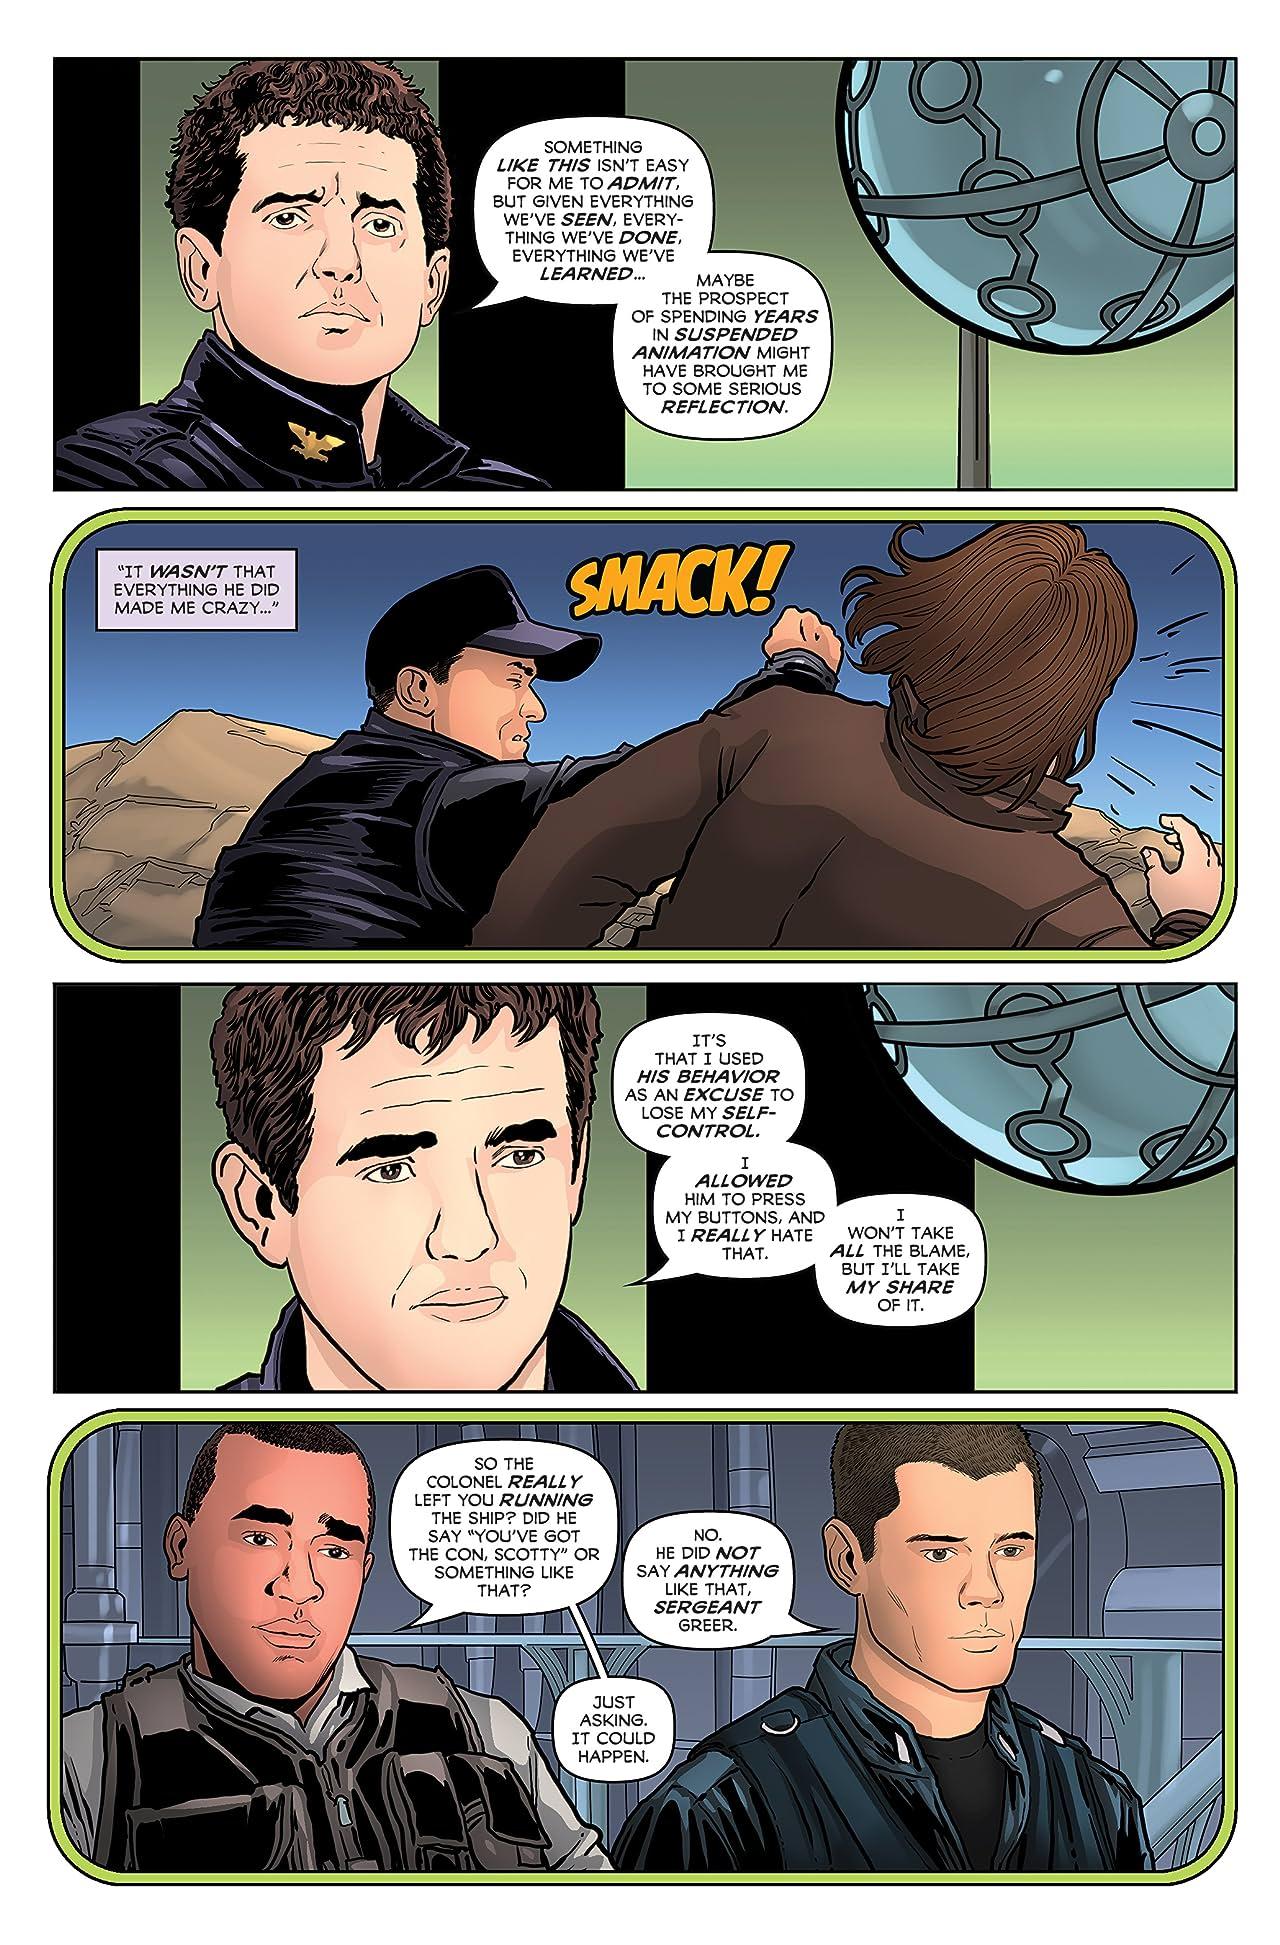 Stargate Atlantis Stargate Universe Anthology Ongoing #2